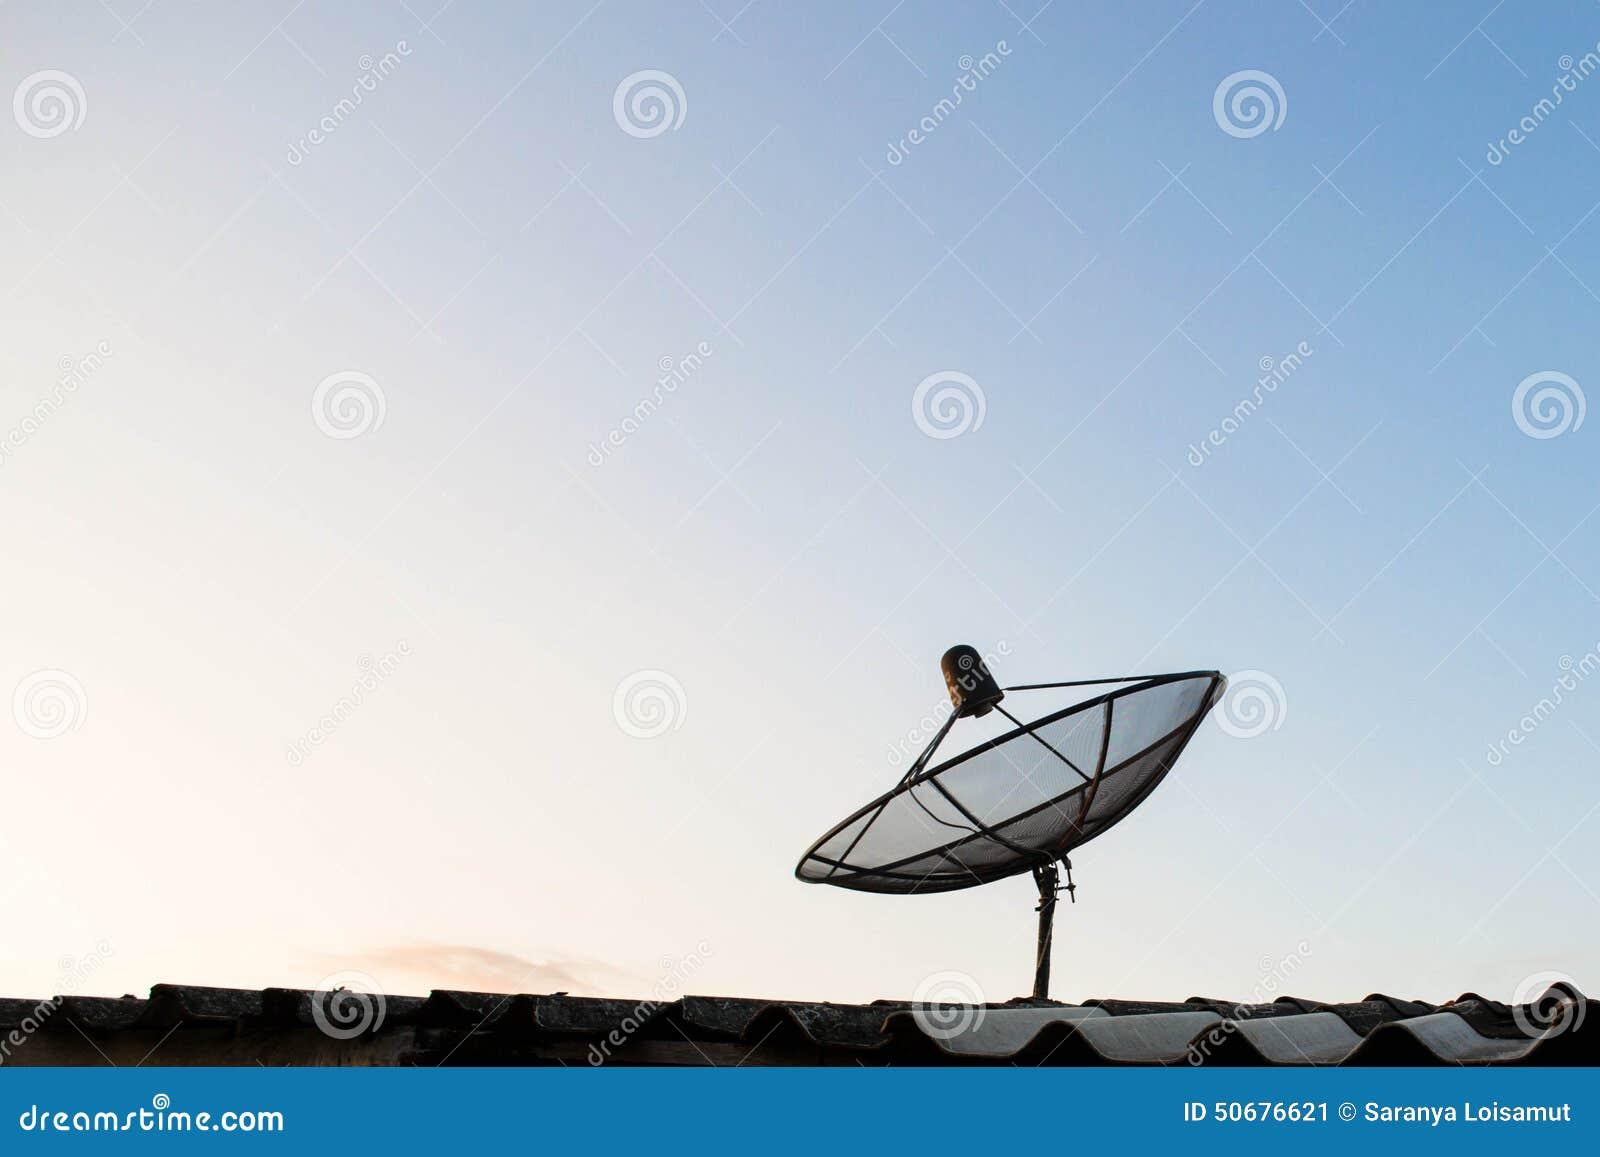 Download 在屋顶的卫星盘天线 库存图片. 图片 包括有 查出, 蓝色, 蜂窝电话, 天线, 装备, 云彩, 电池, 播报员 - 50676621